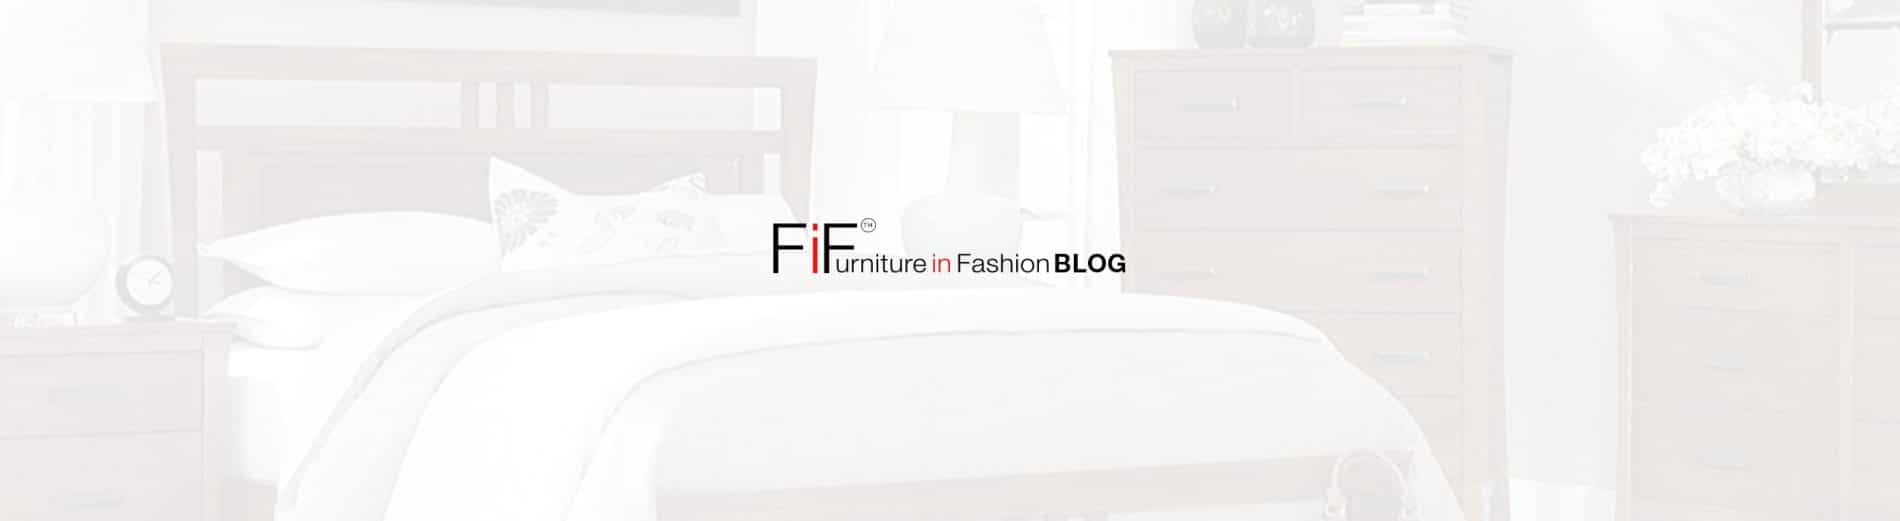 FIF Blog H 1900x521 - Tremendous Business Office Furniture Built for Your Office Decor